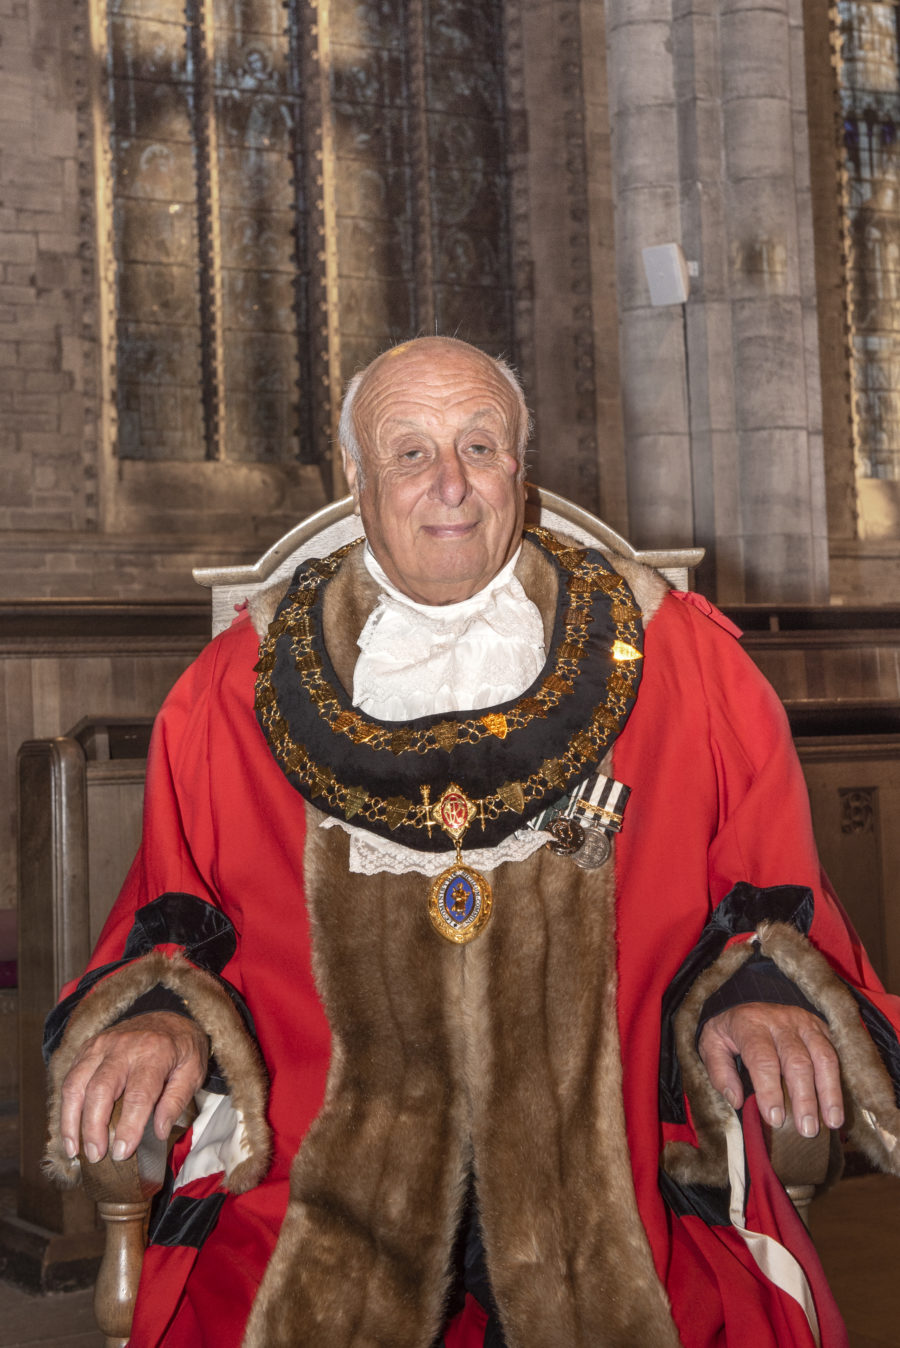 Mayor Clive Thomas